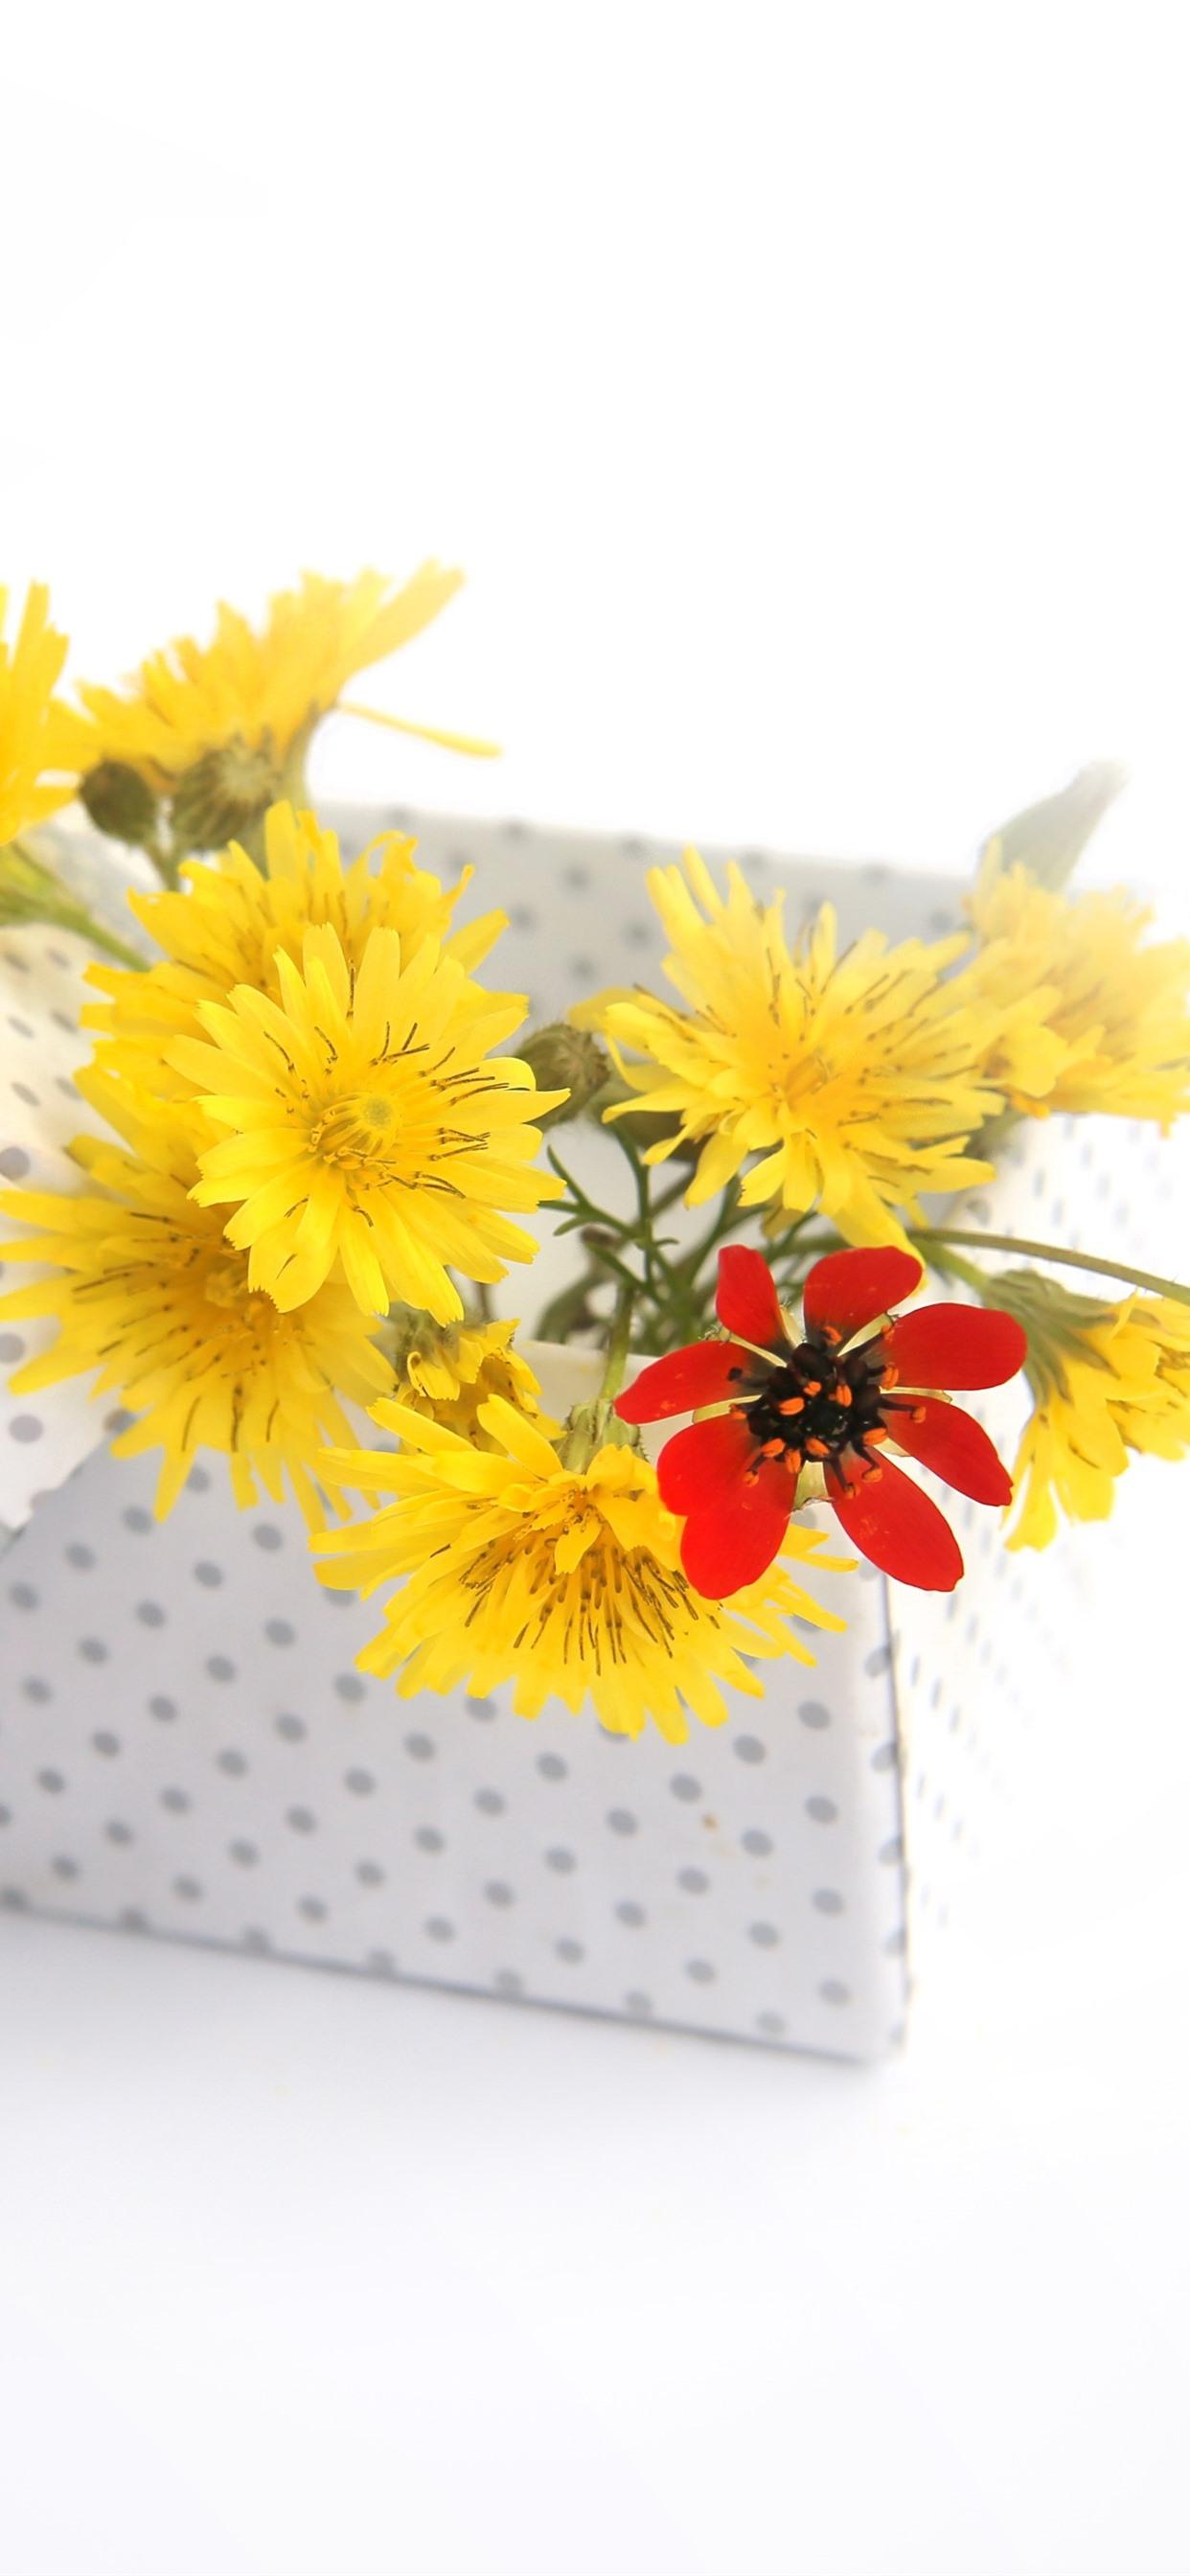 Yellow Flowers Box Gift White Background 1242x2688 Iphone 11